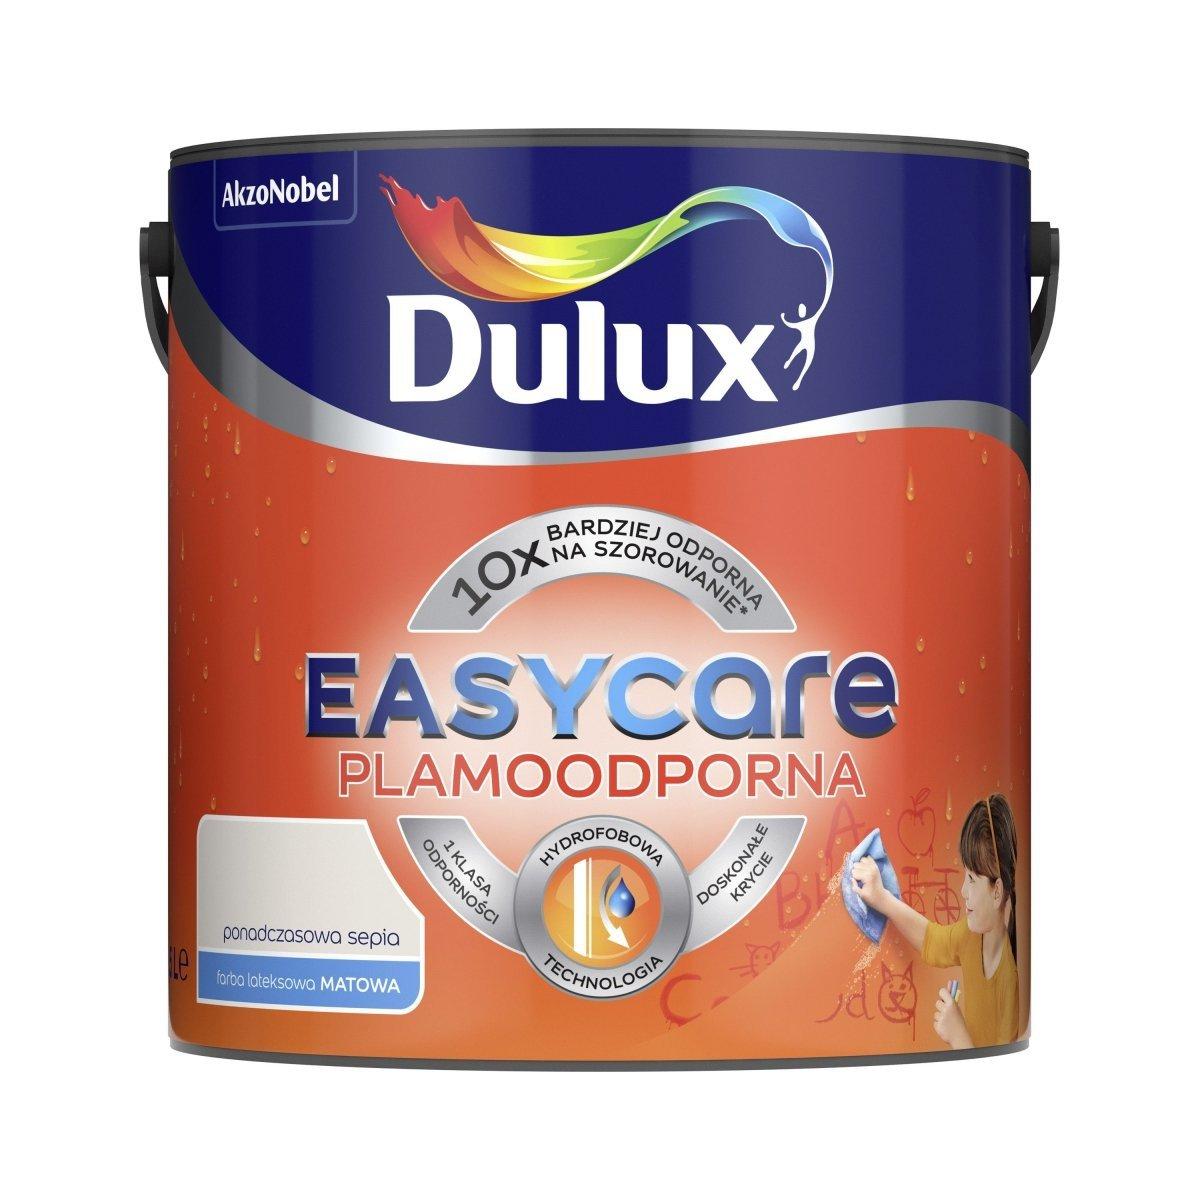 Dulux Easy Care 2 5l Ponadczasowa Sepia Plamoodporna Matowa Farba